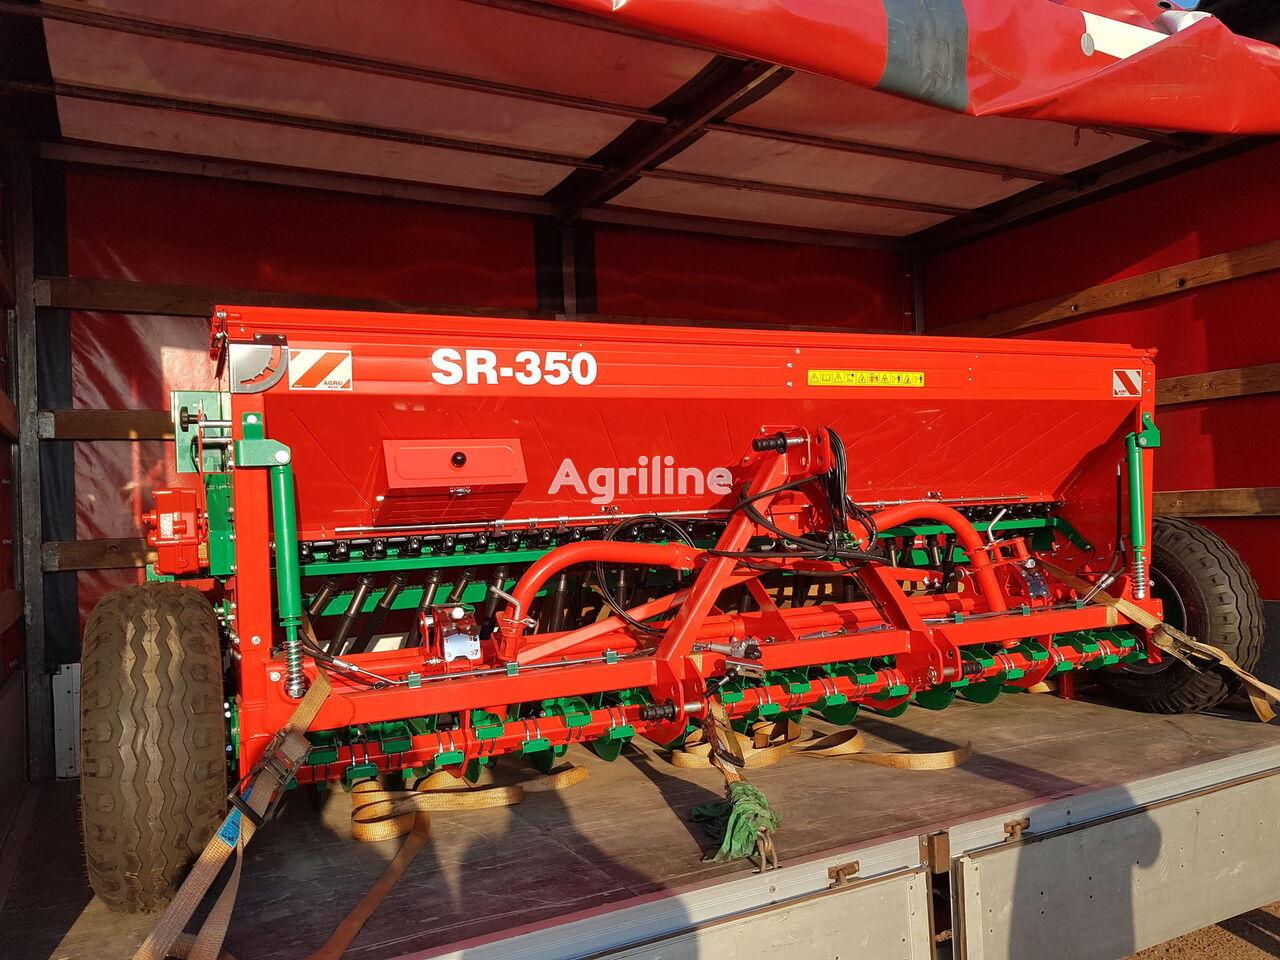 new AGRO-MASZ Sivalka mehanichna nova SR350II GARANTIYa 1 RIK! mechanical seed drill